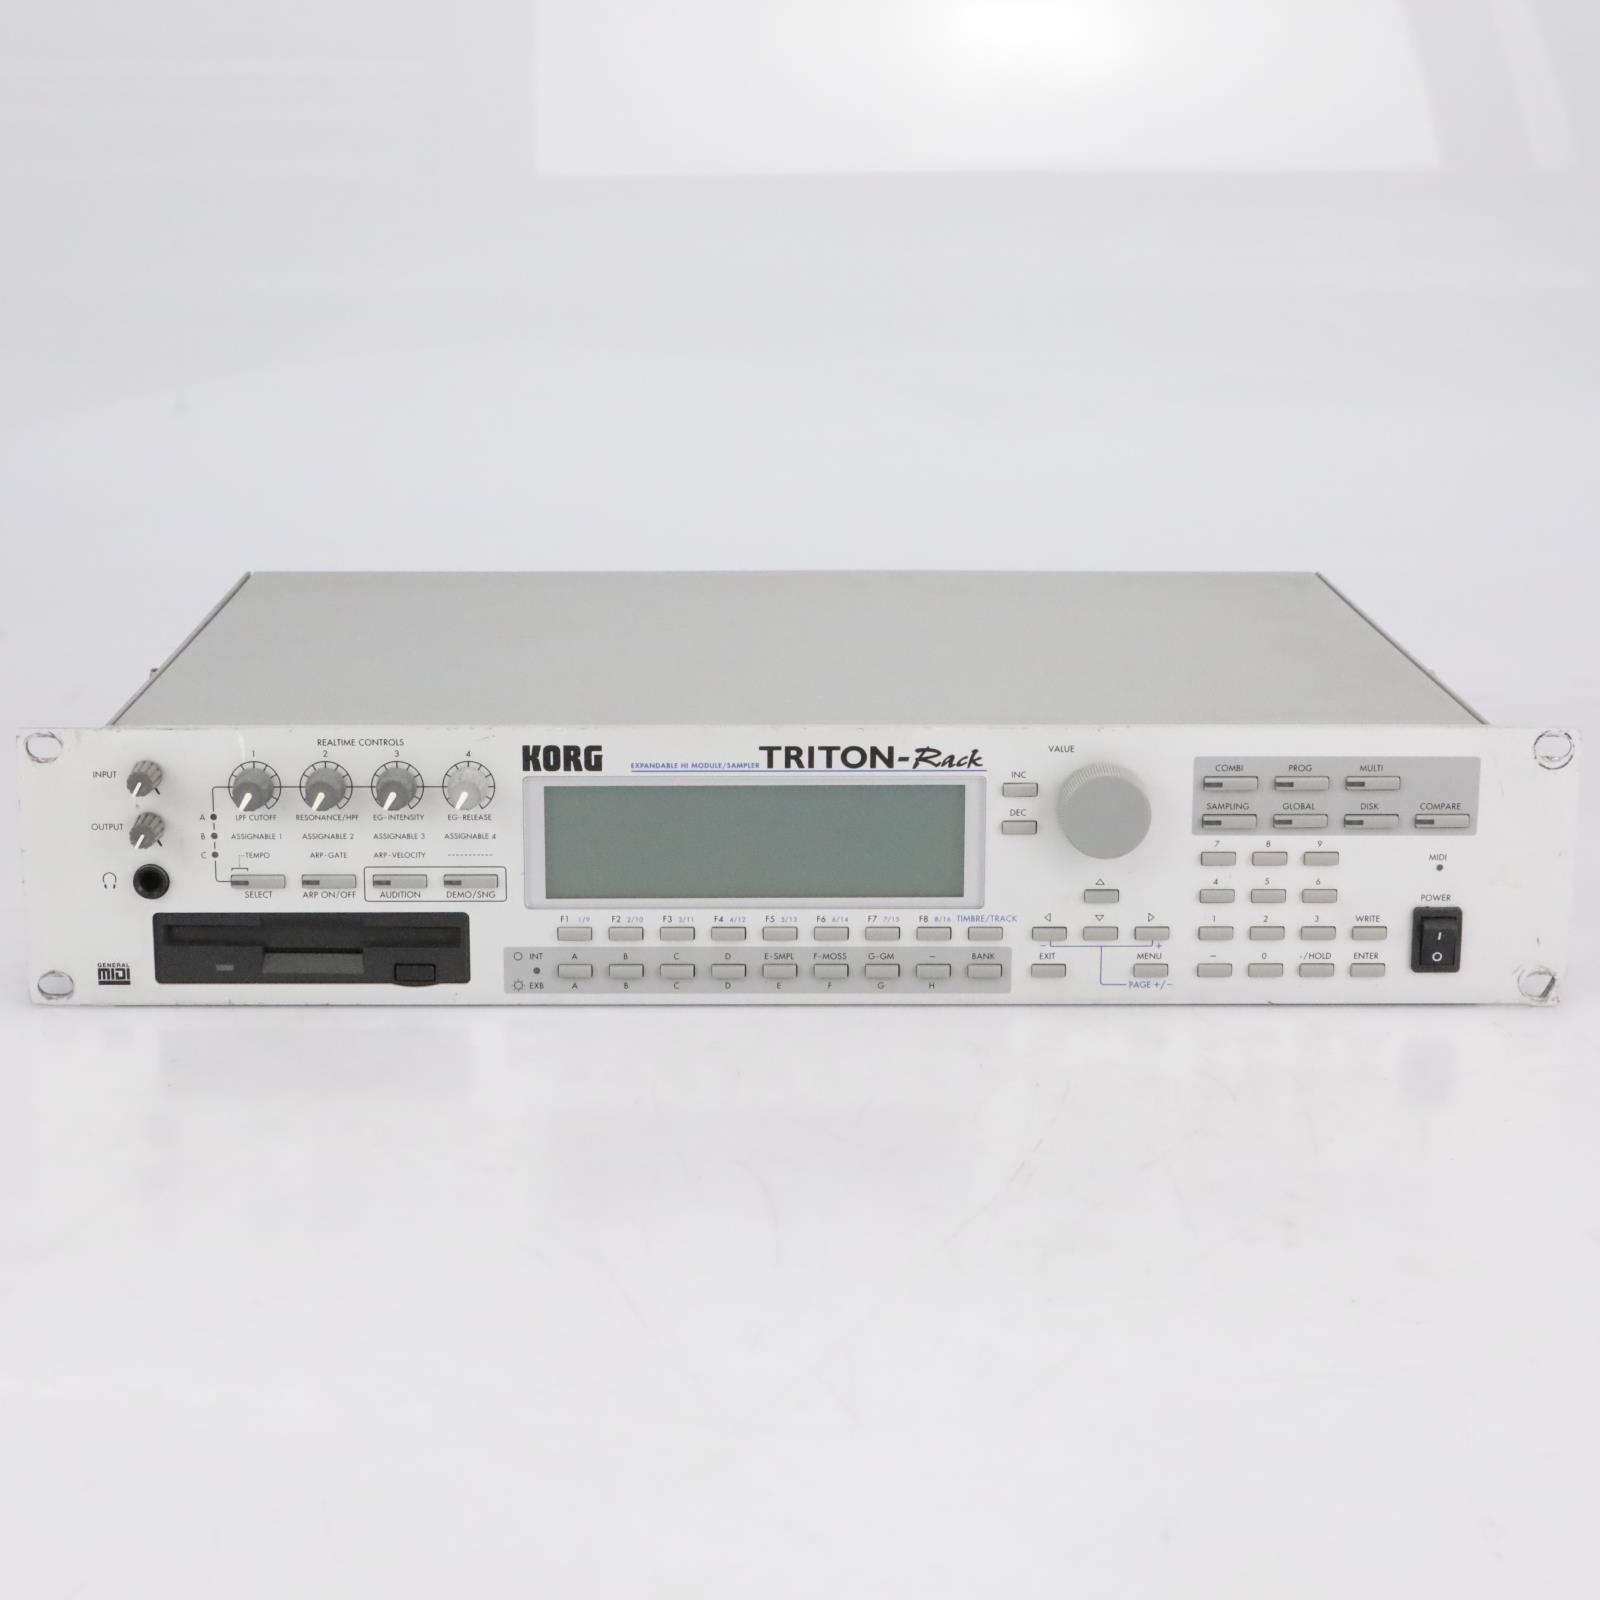 KORG Triton-Rack Workstation Sampler Synthesizer Sound Module #41642